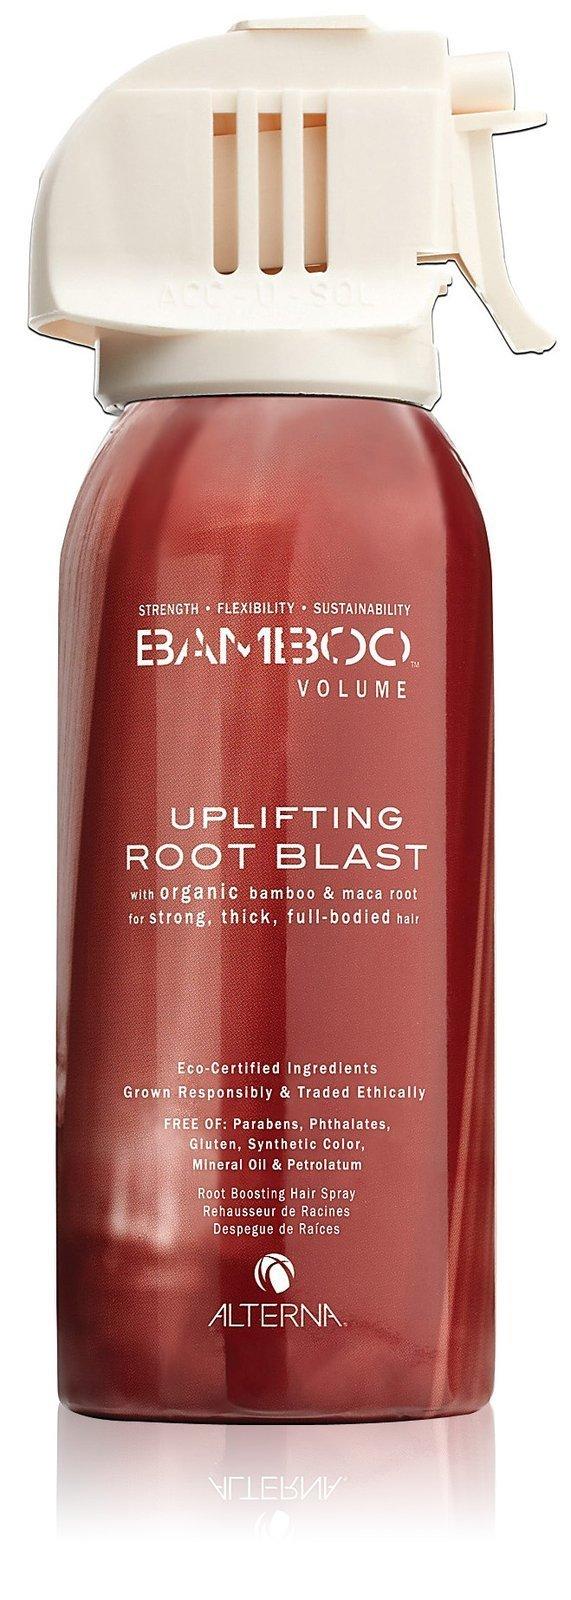 Pokupki customer account login/downloader - Alterna Bamboo Volume Uplifting Root Blast By Alterna For Unisex 2 2 Oz Hair Spray